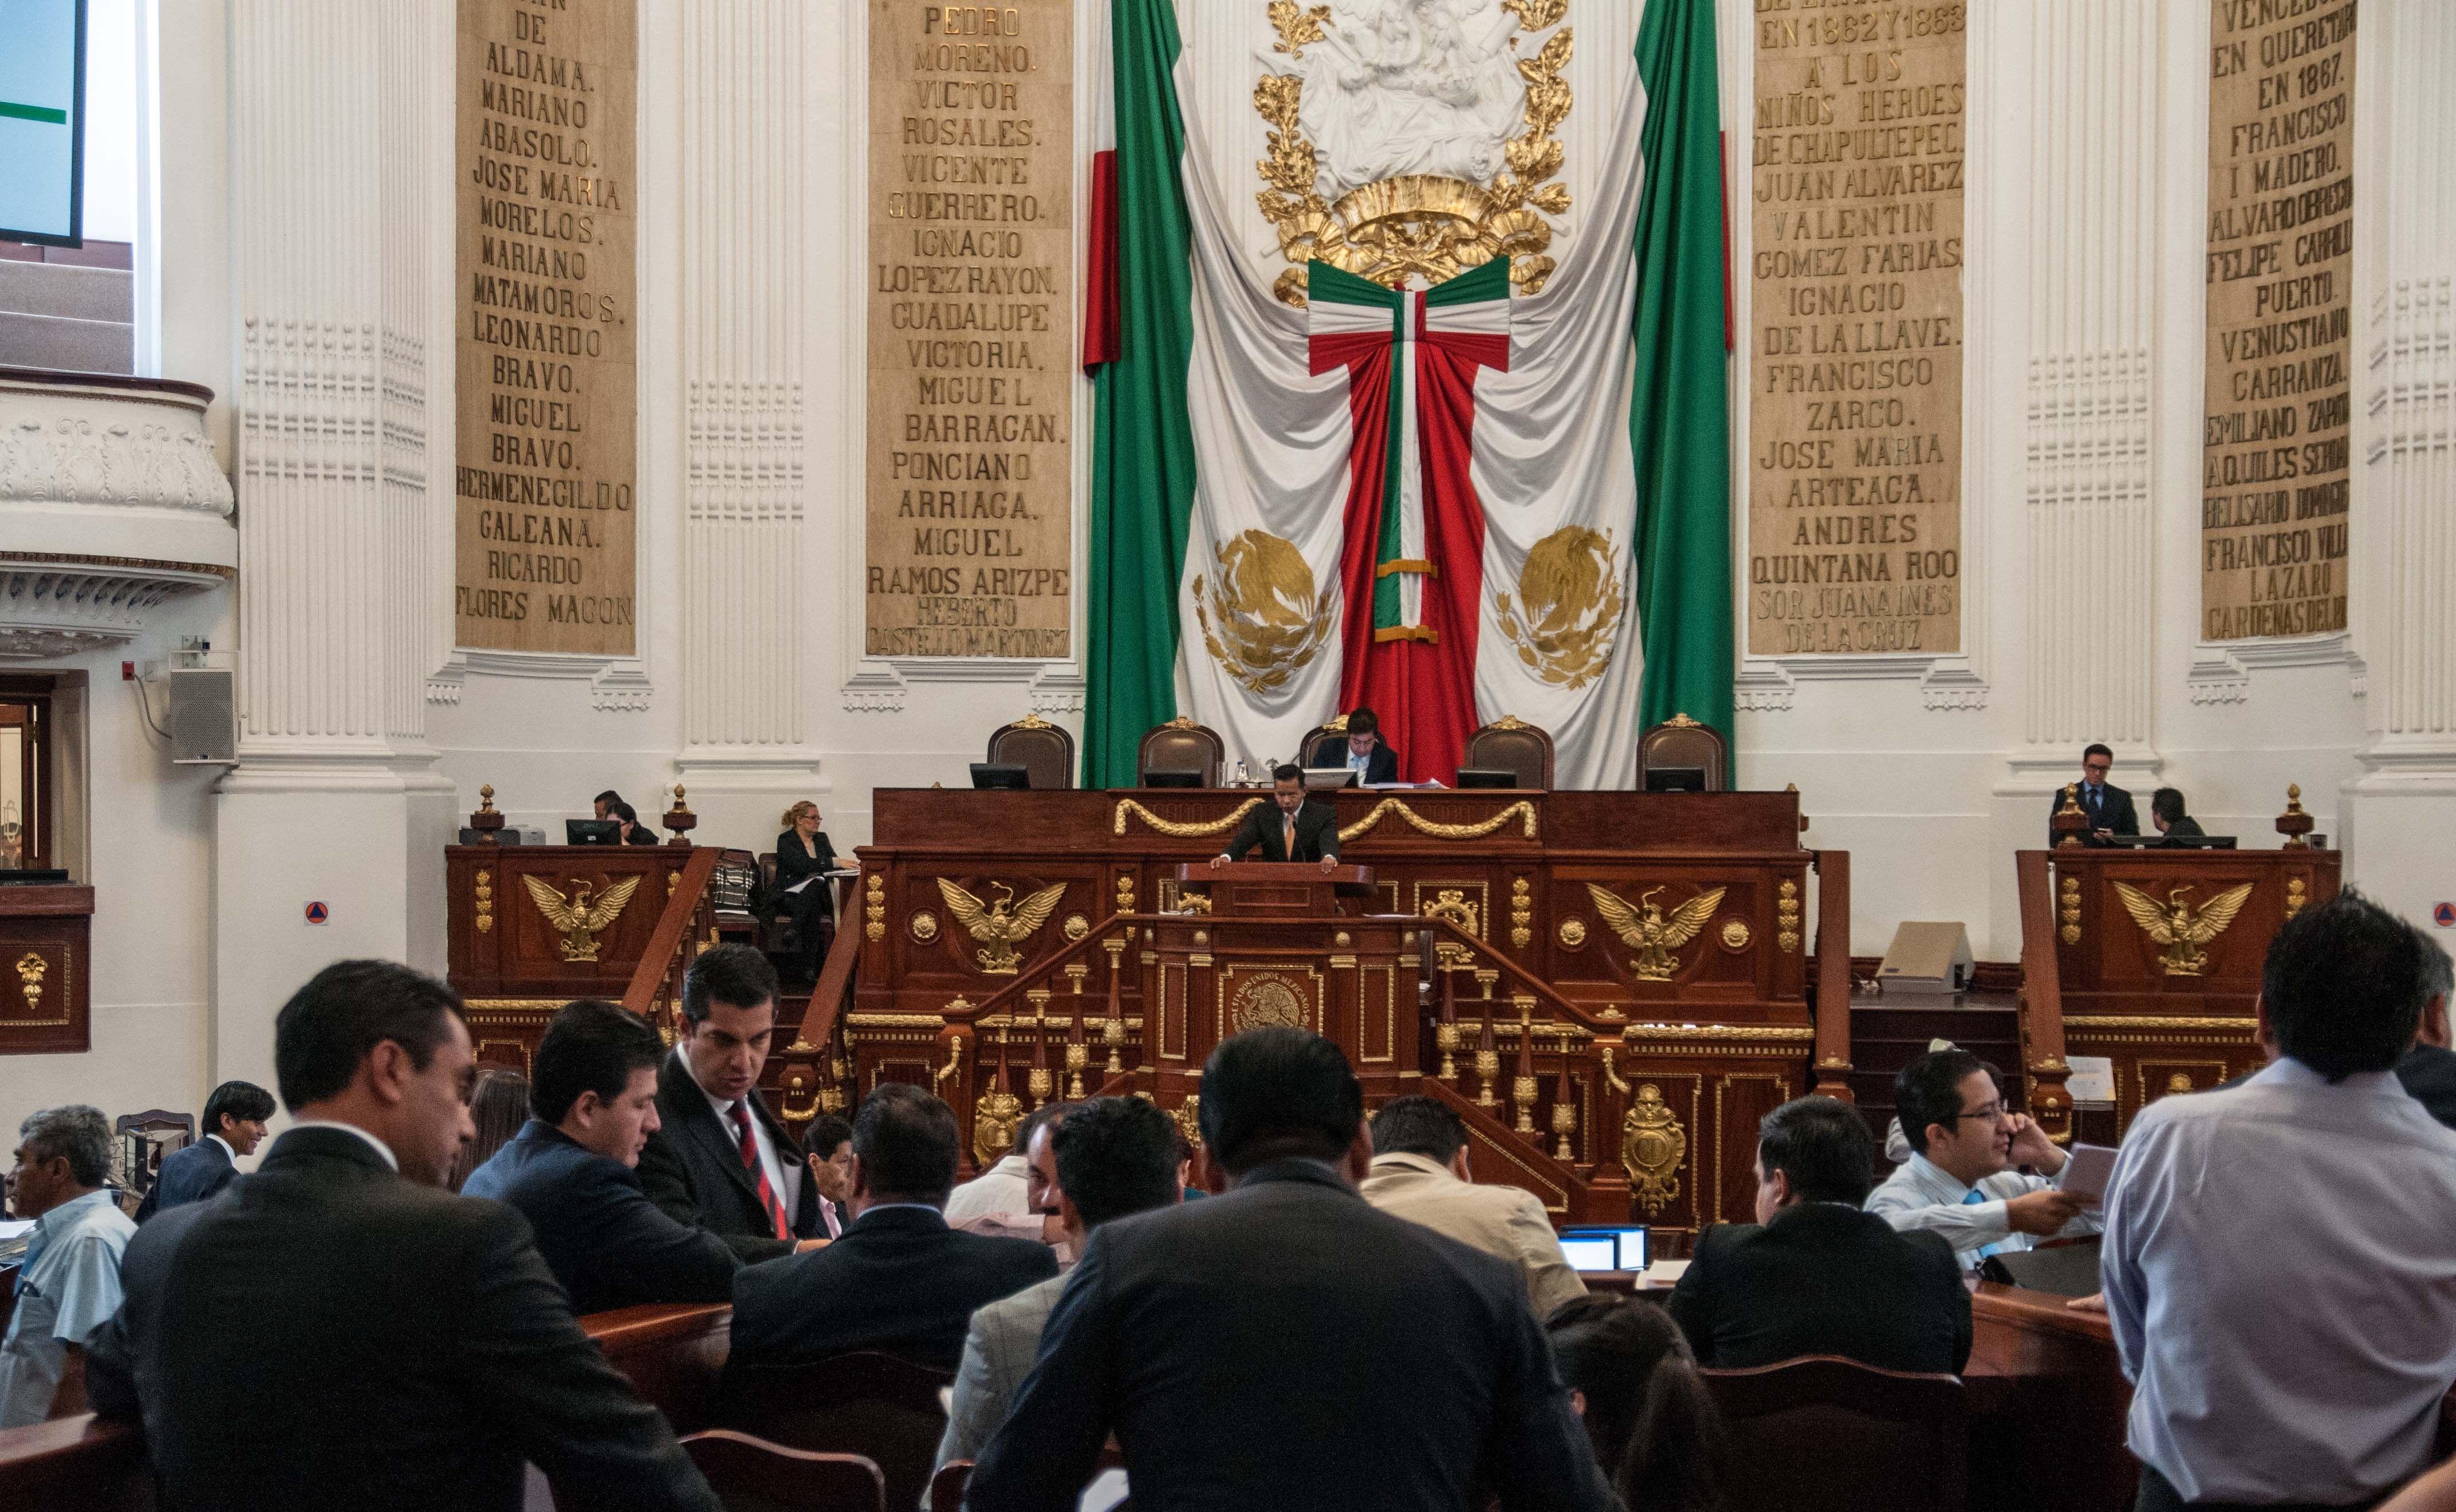 Asambnlea Legislativa del Distrito Federal